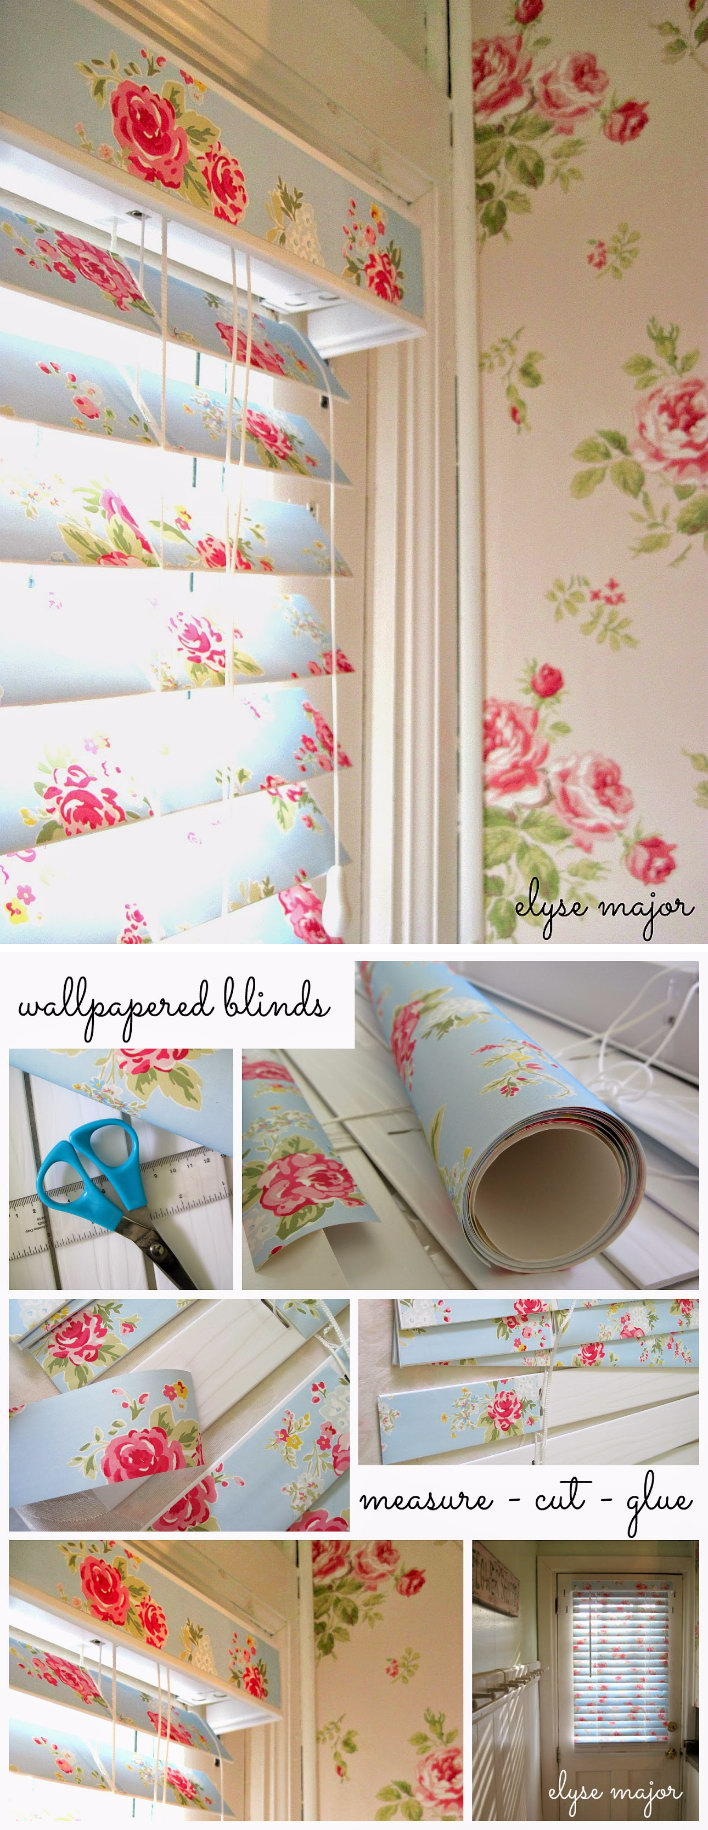 Shabby Chic Wallpaper Covered Blinds